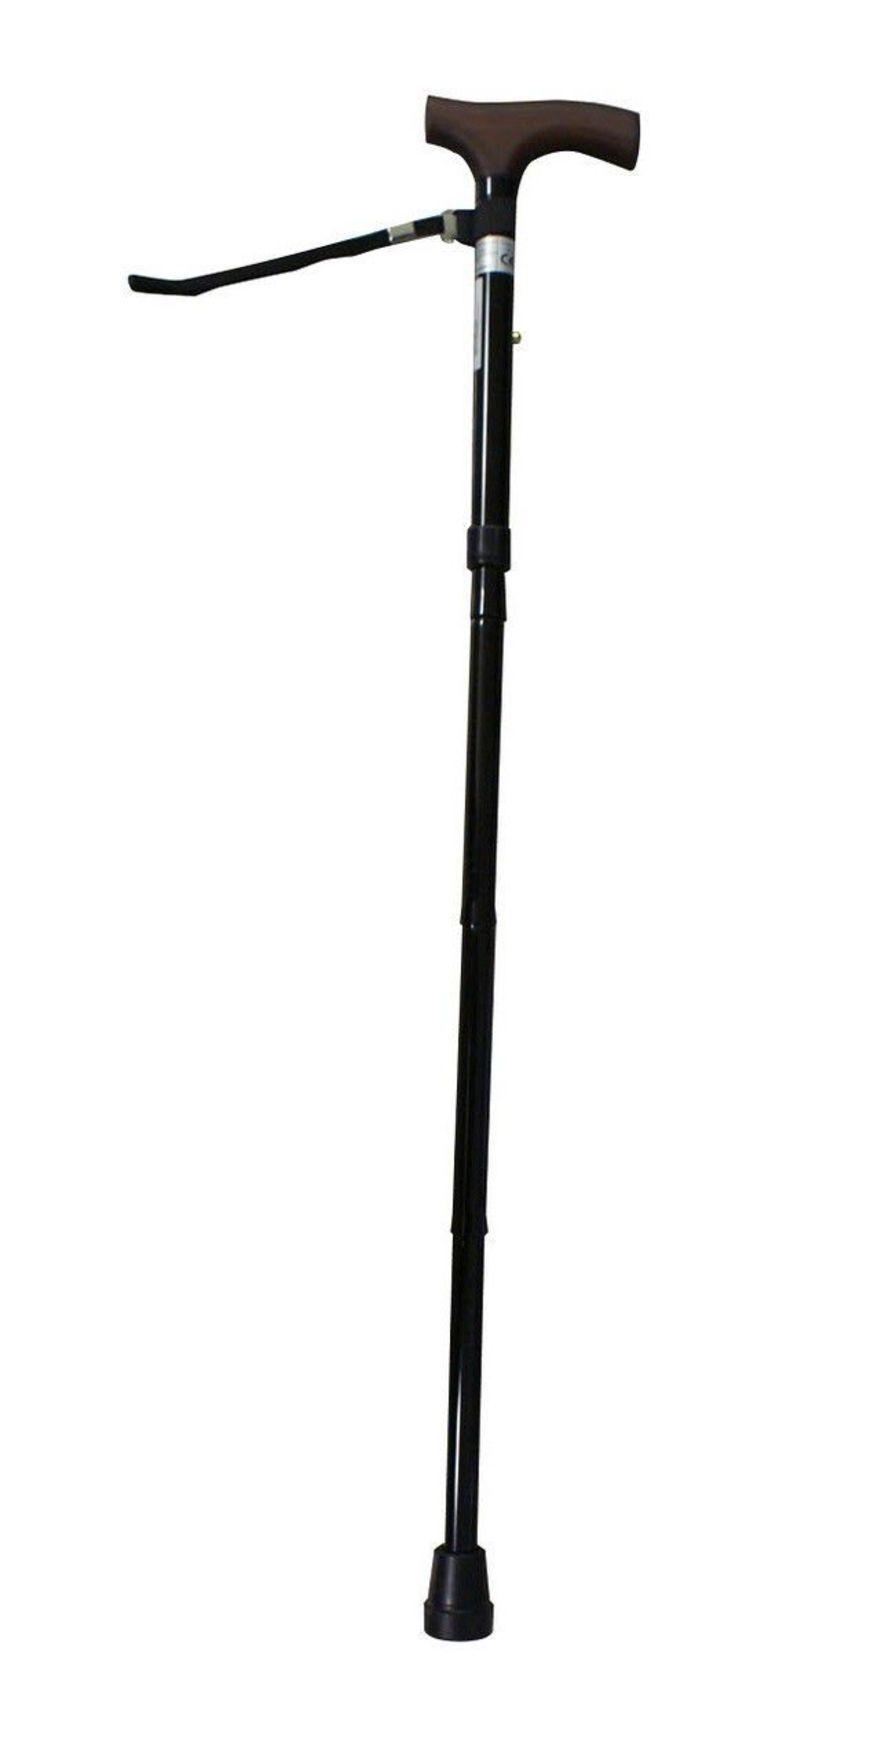 T handle walking stick / folding / height-adjustable C44 HMS-VILGO